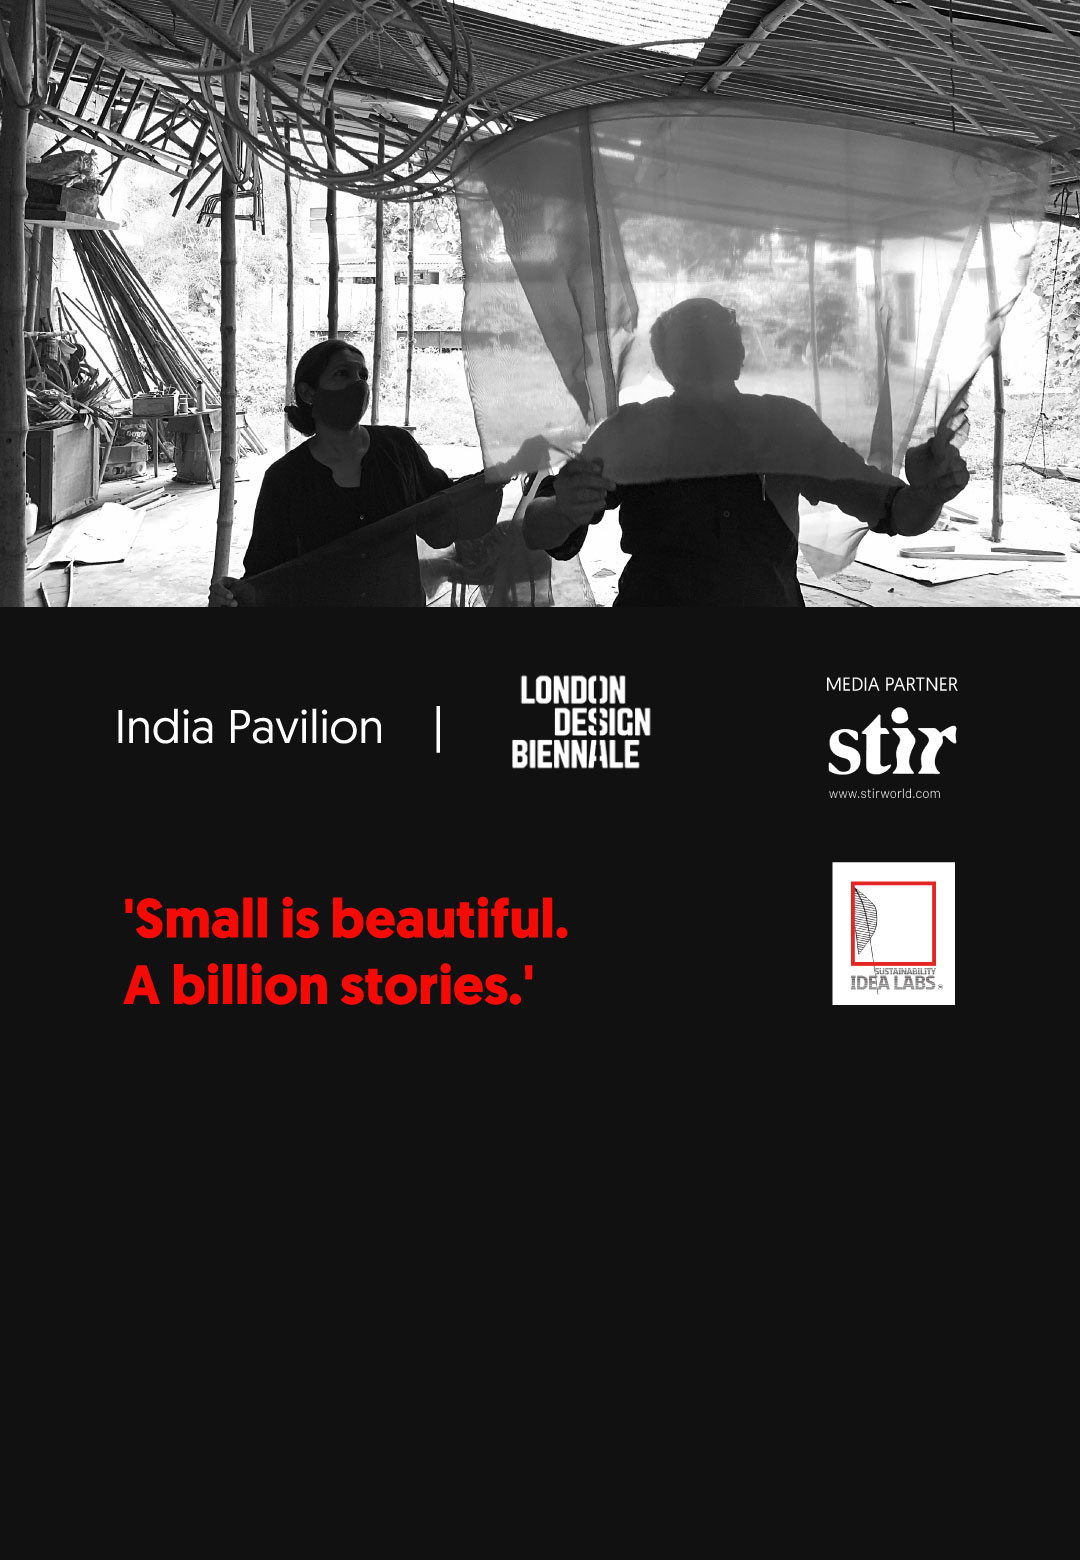 Nisha Mathew Ghosh and Soumitro Ghosh working on the India Pavilion installation | India Pavilion | London Design Biennale 2021 | STIRworld